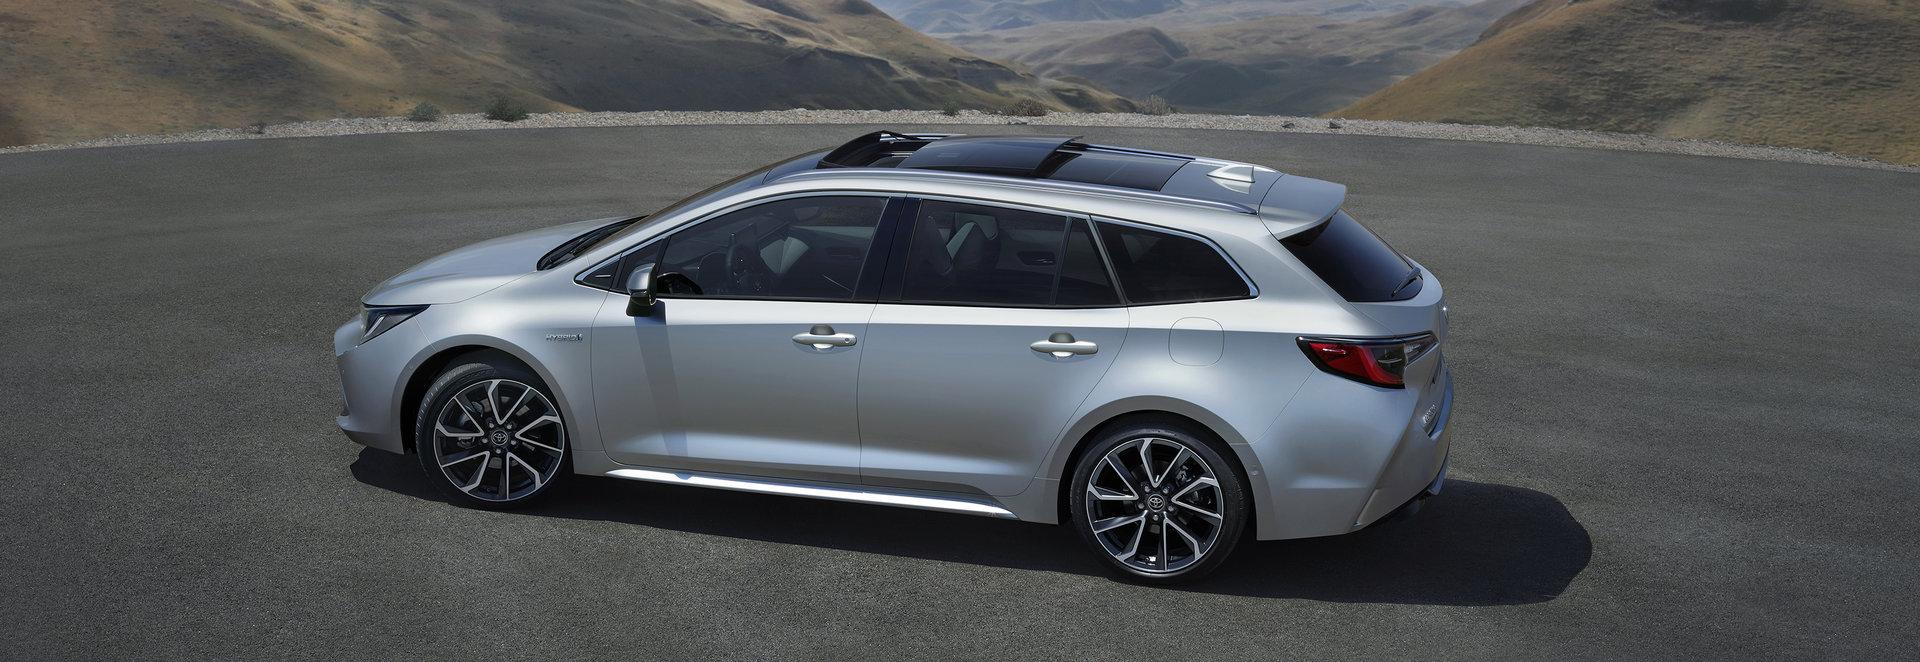 Toyota Corolla hybrid Touring Sports, ¿quién necesita diésel para hacer kilómetros?